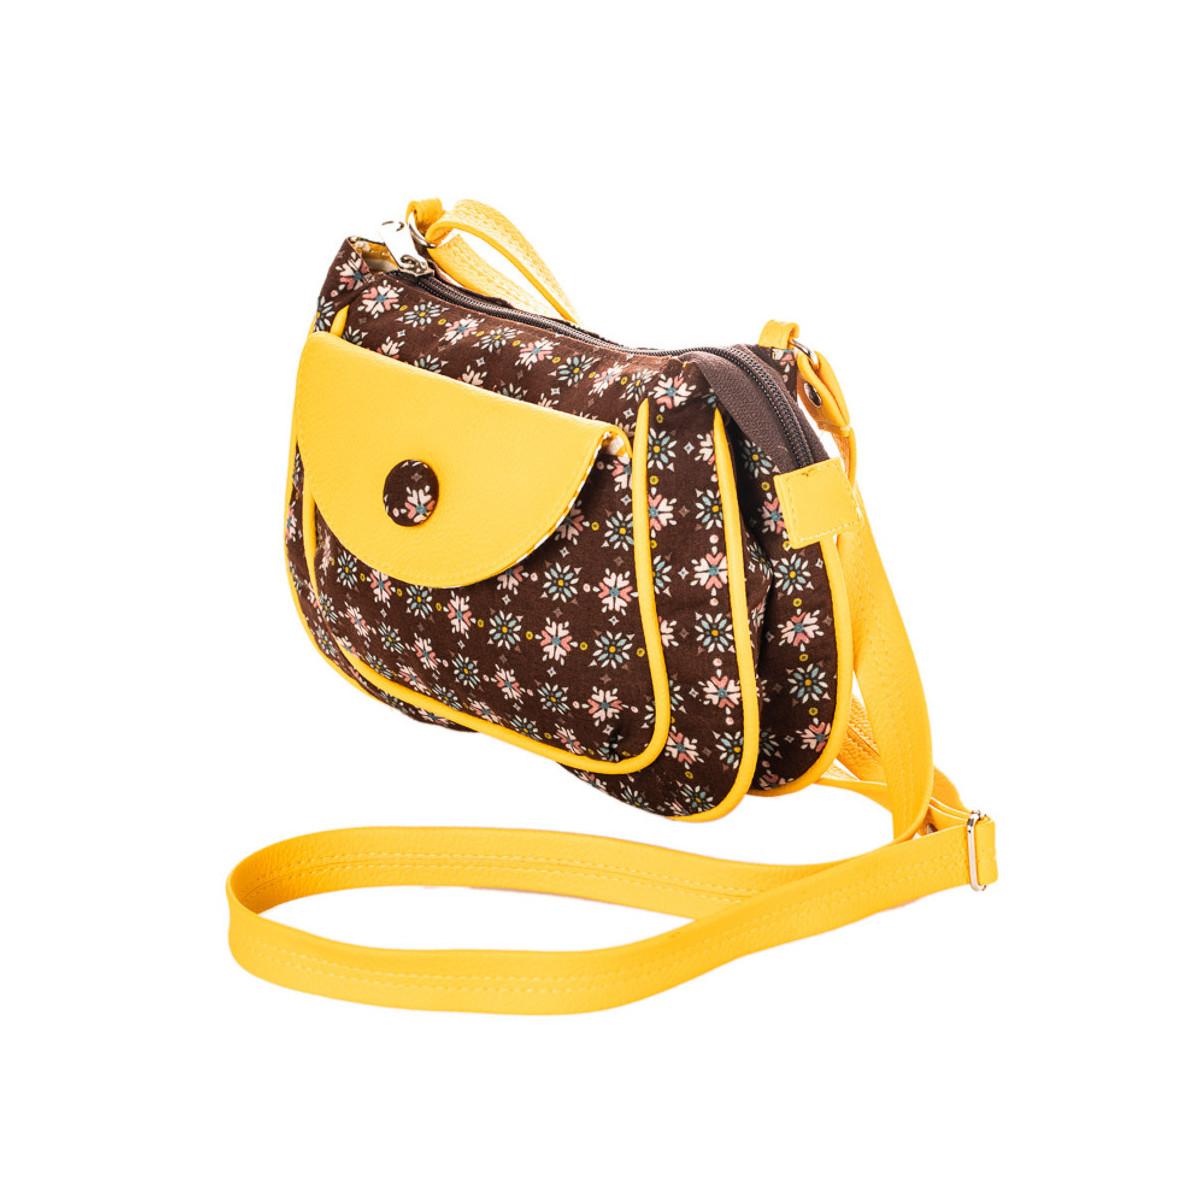 petit sac besace bandoulière tissu jaune et marron chocolat